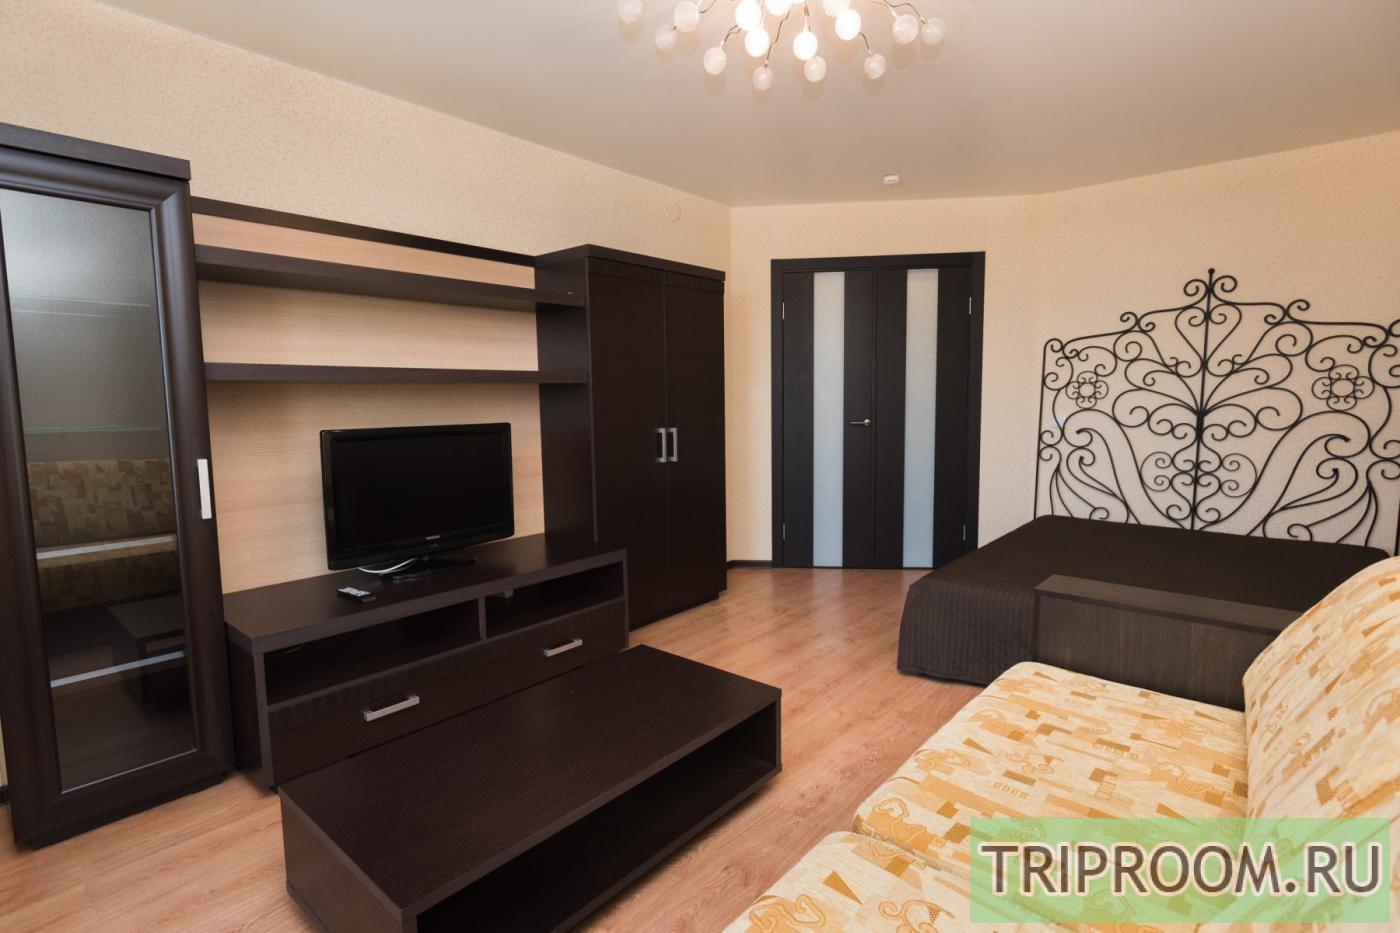 1-комнатная квартира посуточно (вариант № 16259), ул. Смазчиков улица, фото № 2